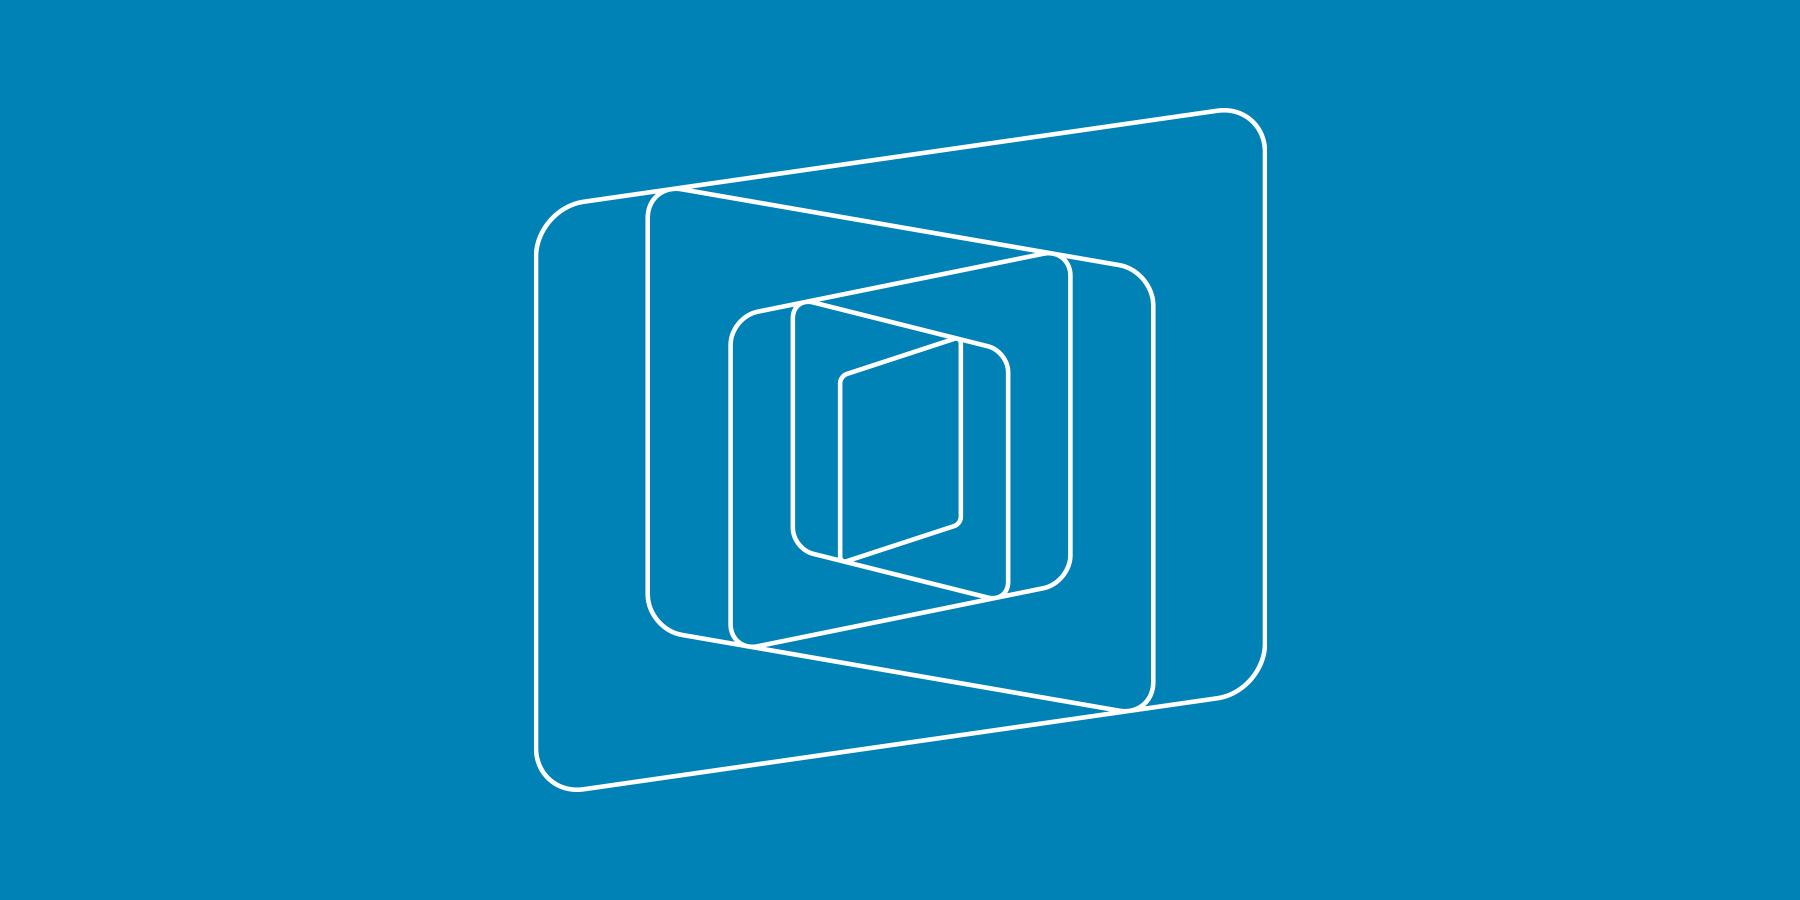 signalive-logo-design-03